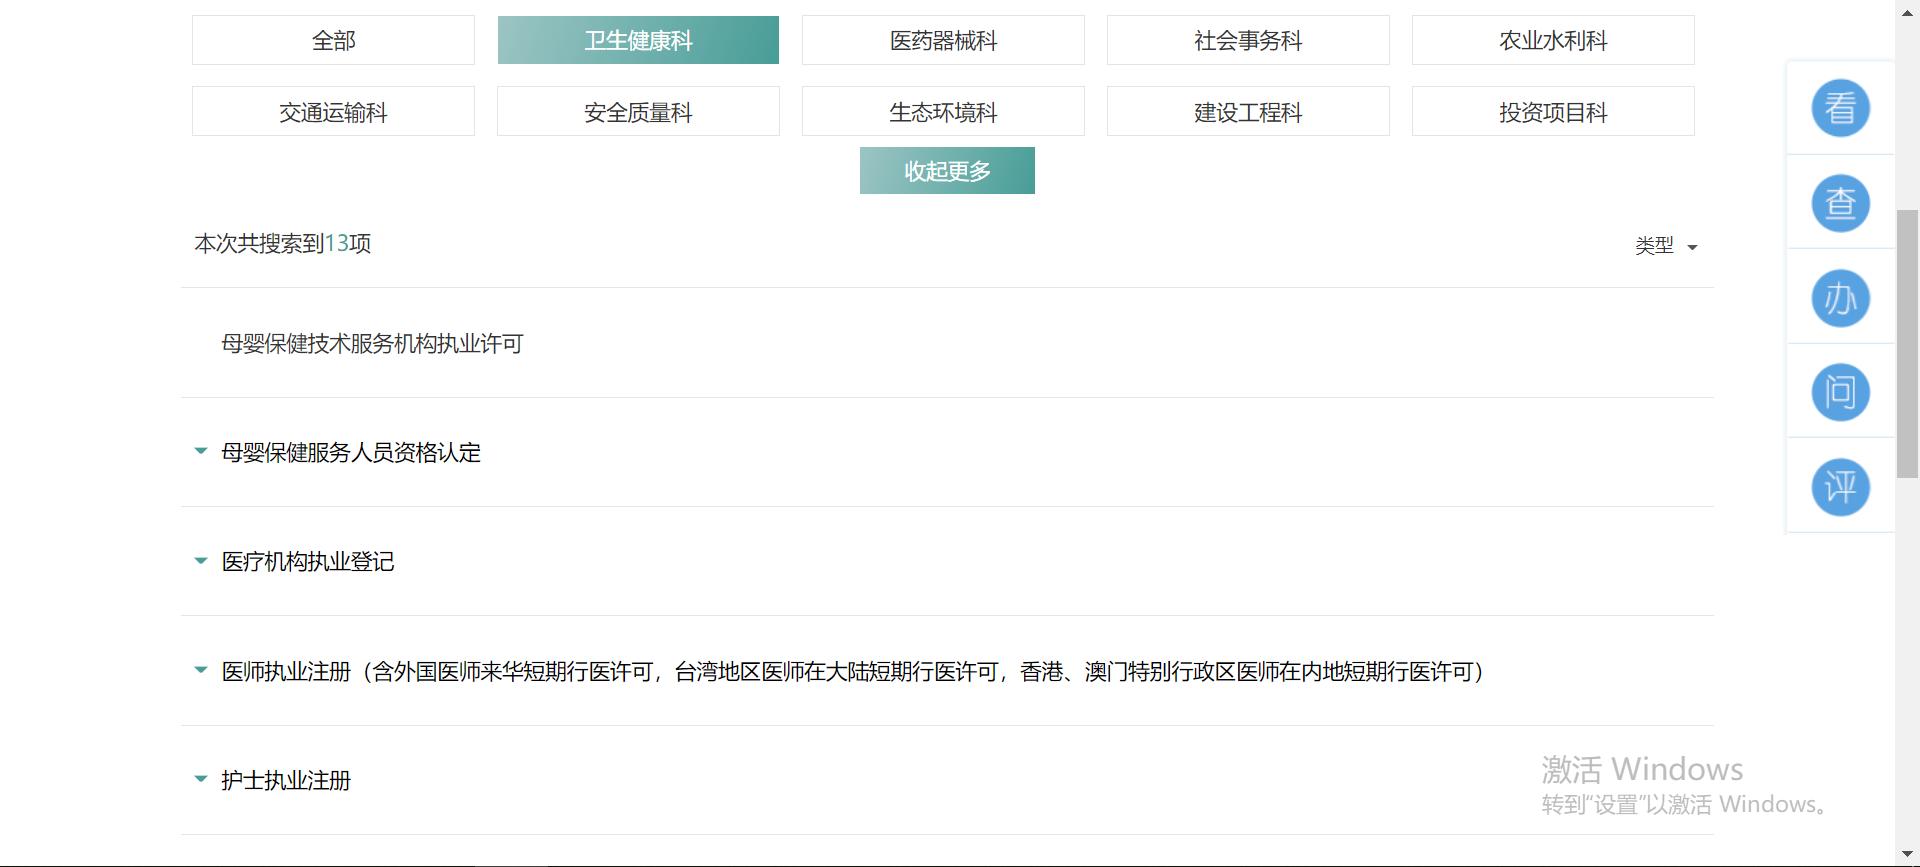 C:UsersAdministratorDesktop\u56fe片10.png